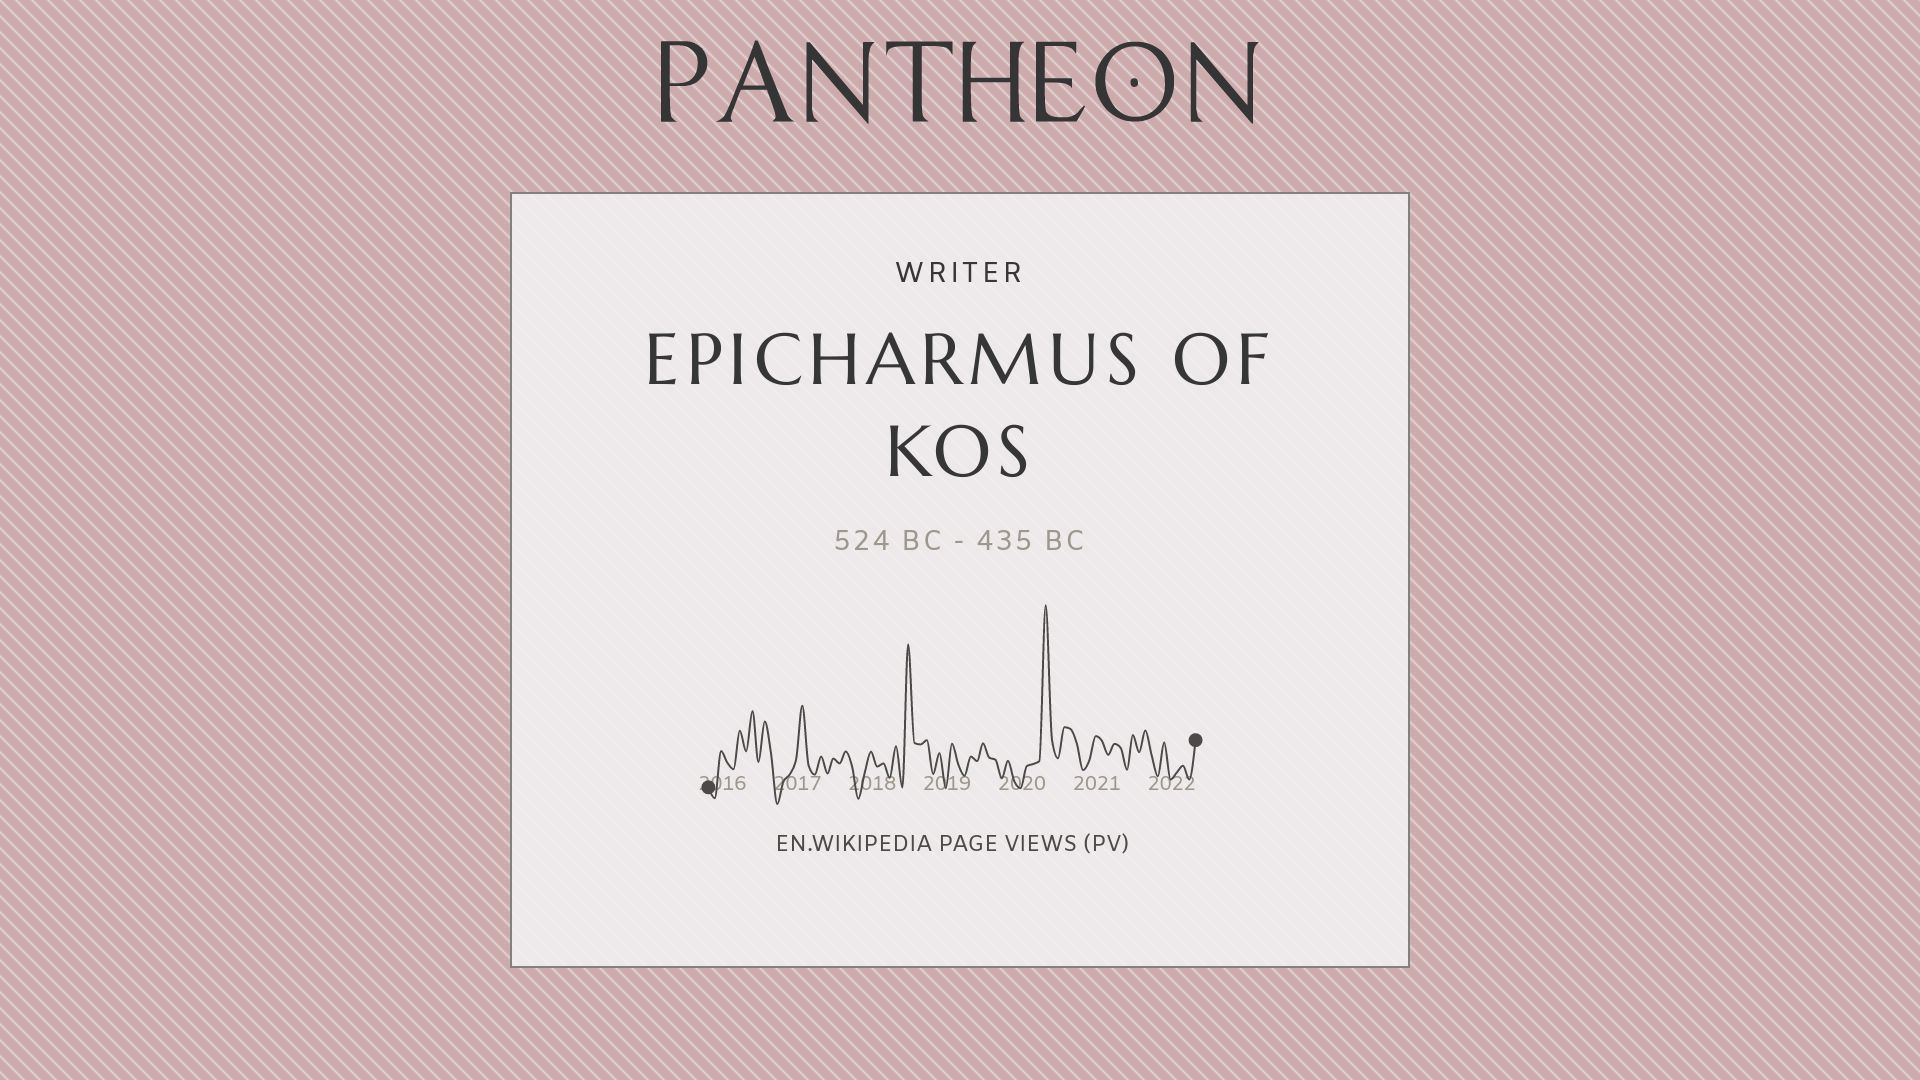 Epicharmus of Kos Biography